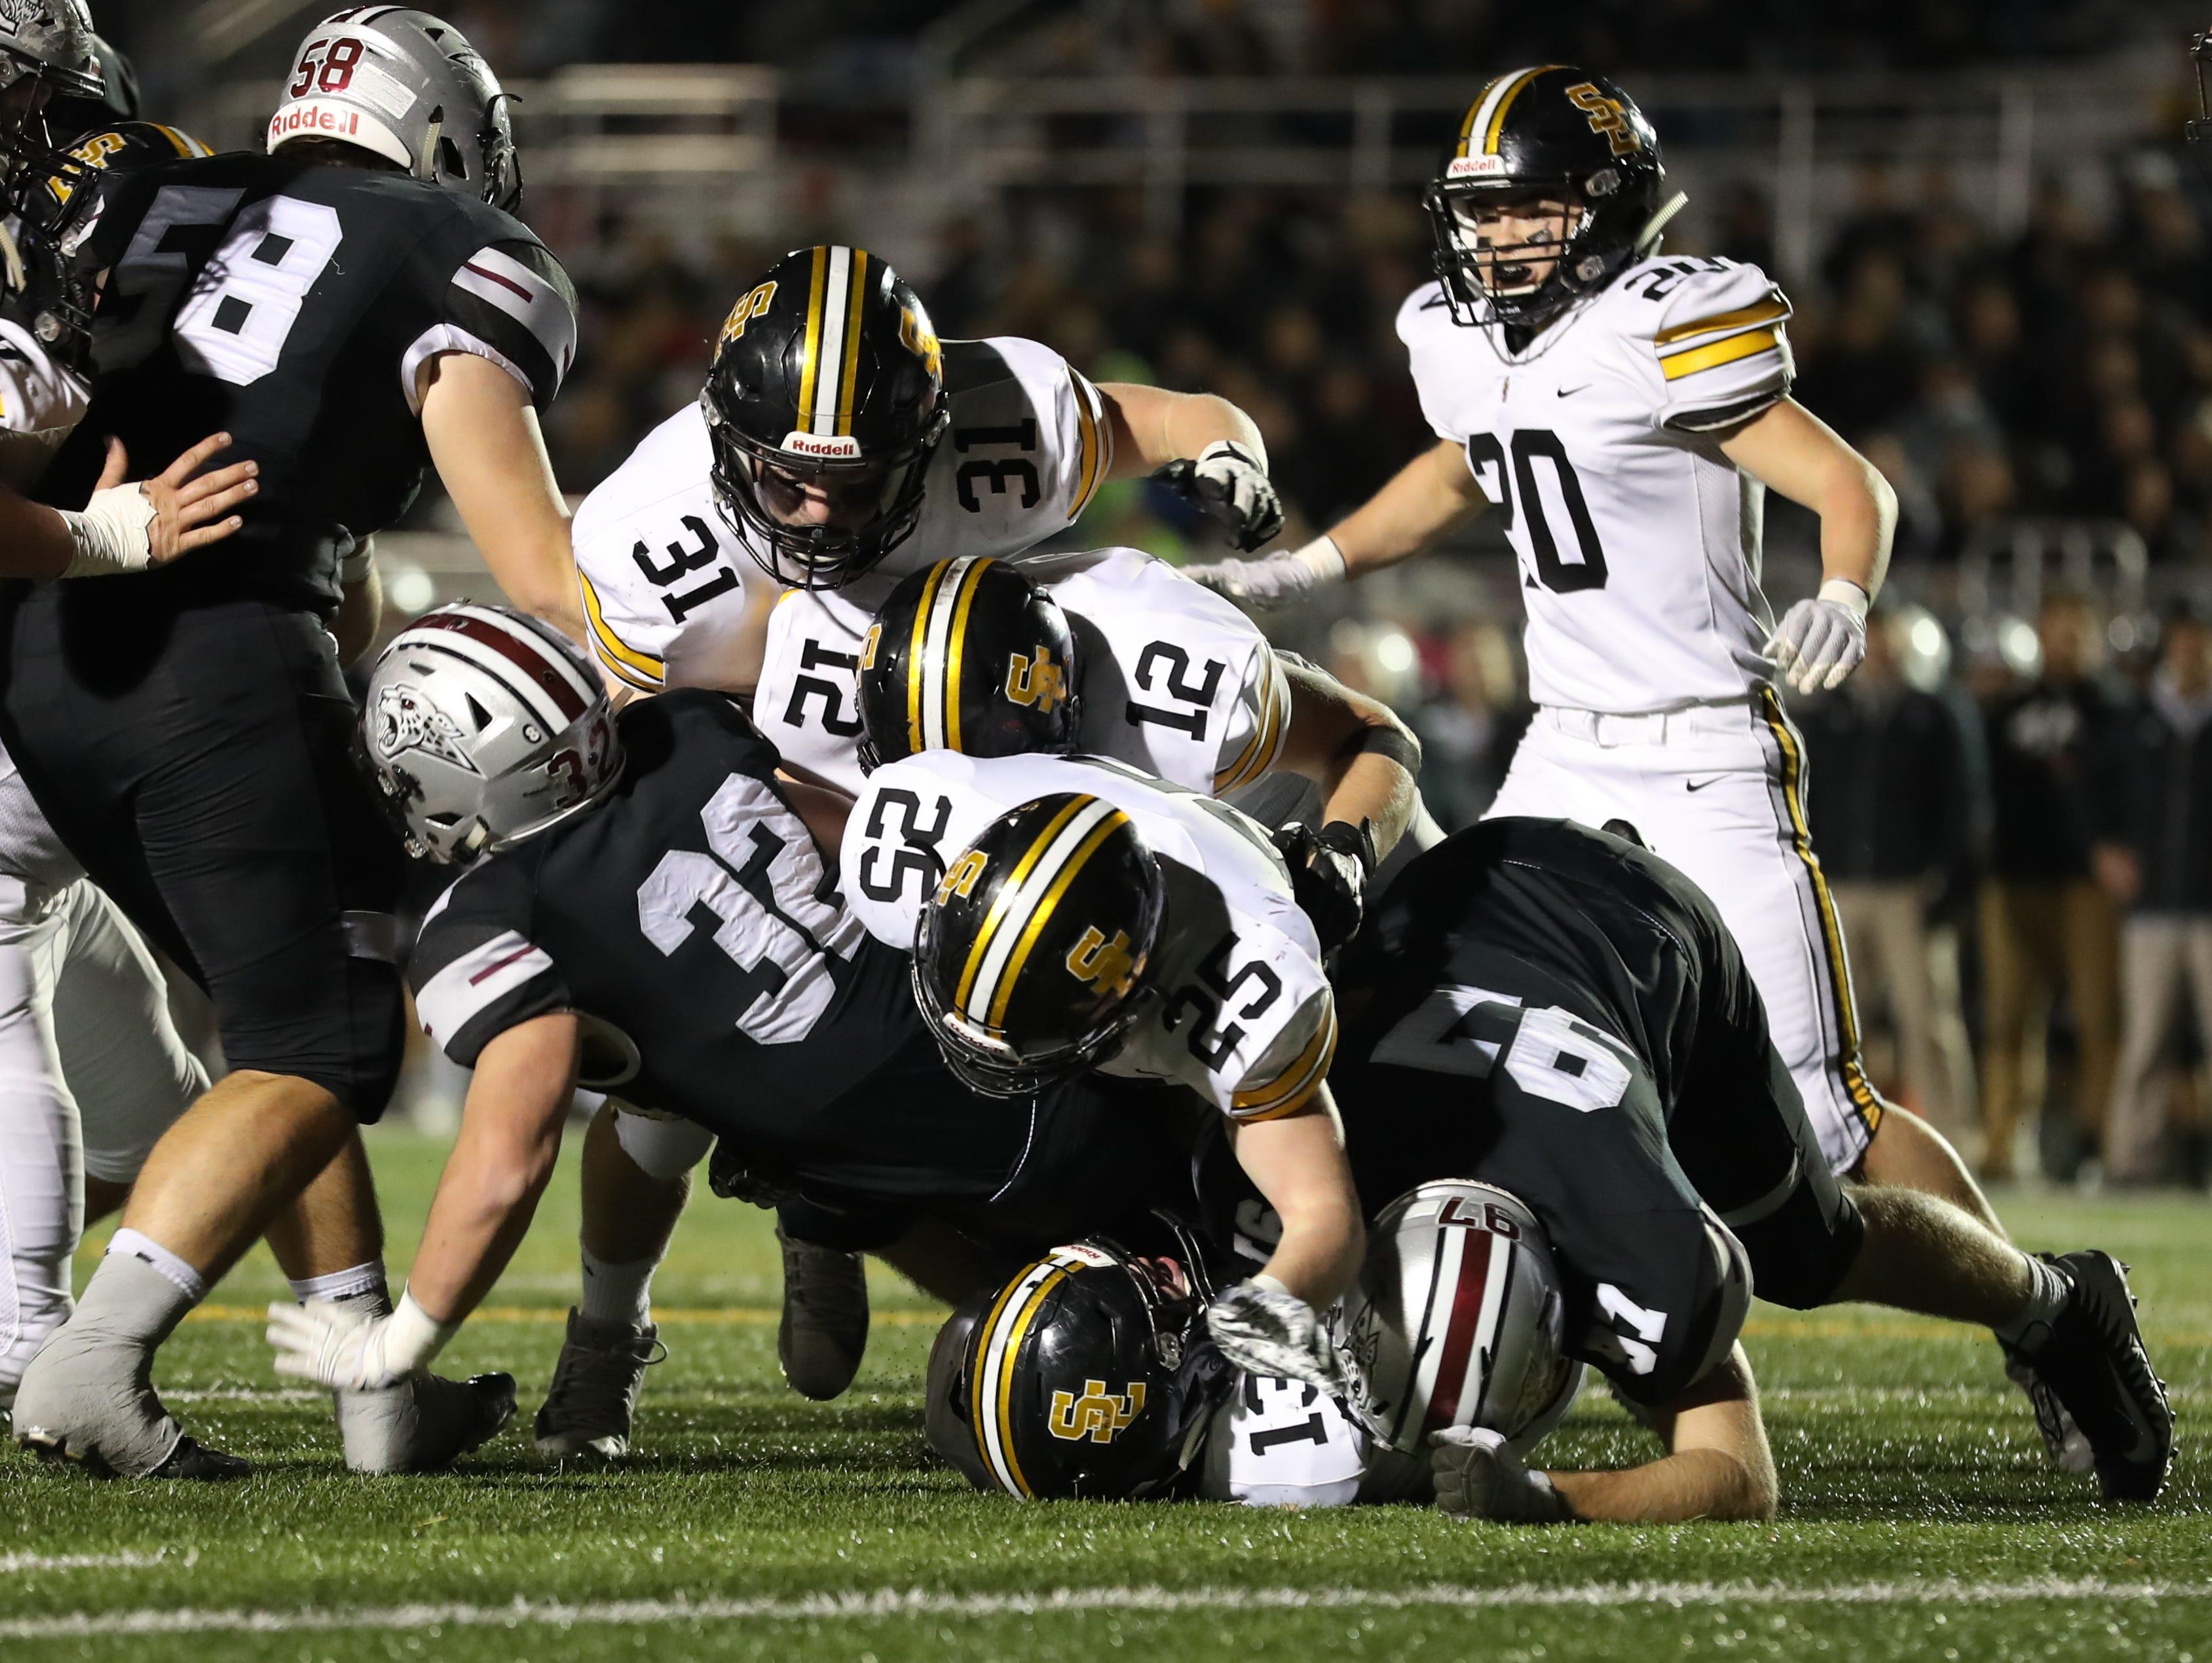 Ankeny Centennial Jaguars Gabe Godwin (32) is tackled by Southeast Polk Rams Jacob Robillard (13) and Southeast Polk Rams Zach Strickland (25) at Ankeny football stadium.